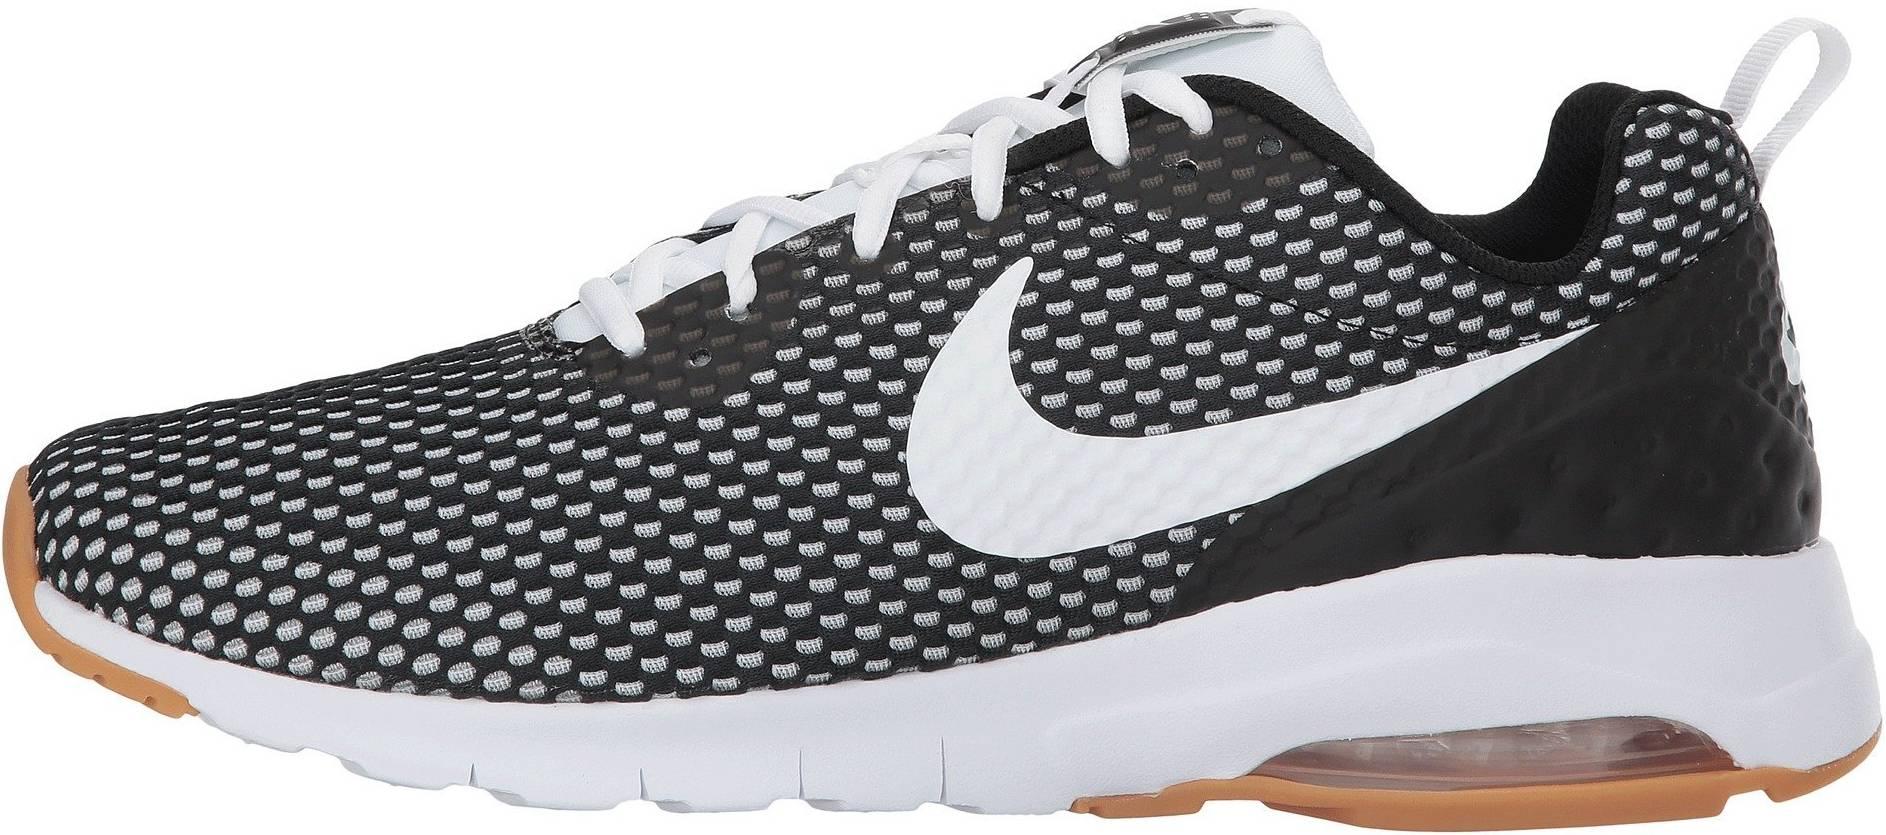 De hecho Amplificador auditoría  Nike Air Max Motion LW SE sneakers in 5 colors (only $70)   RunRepeat